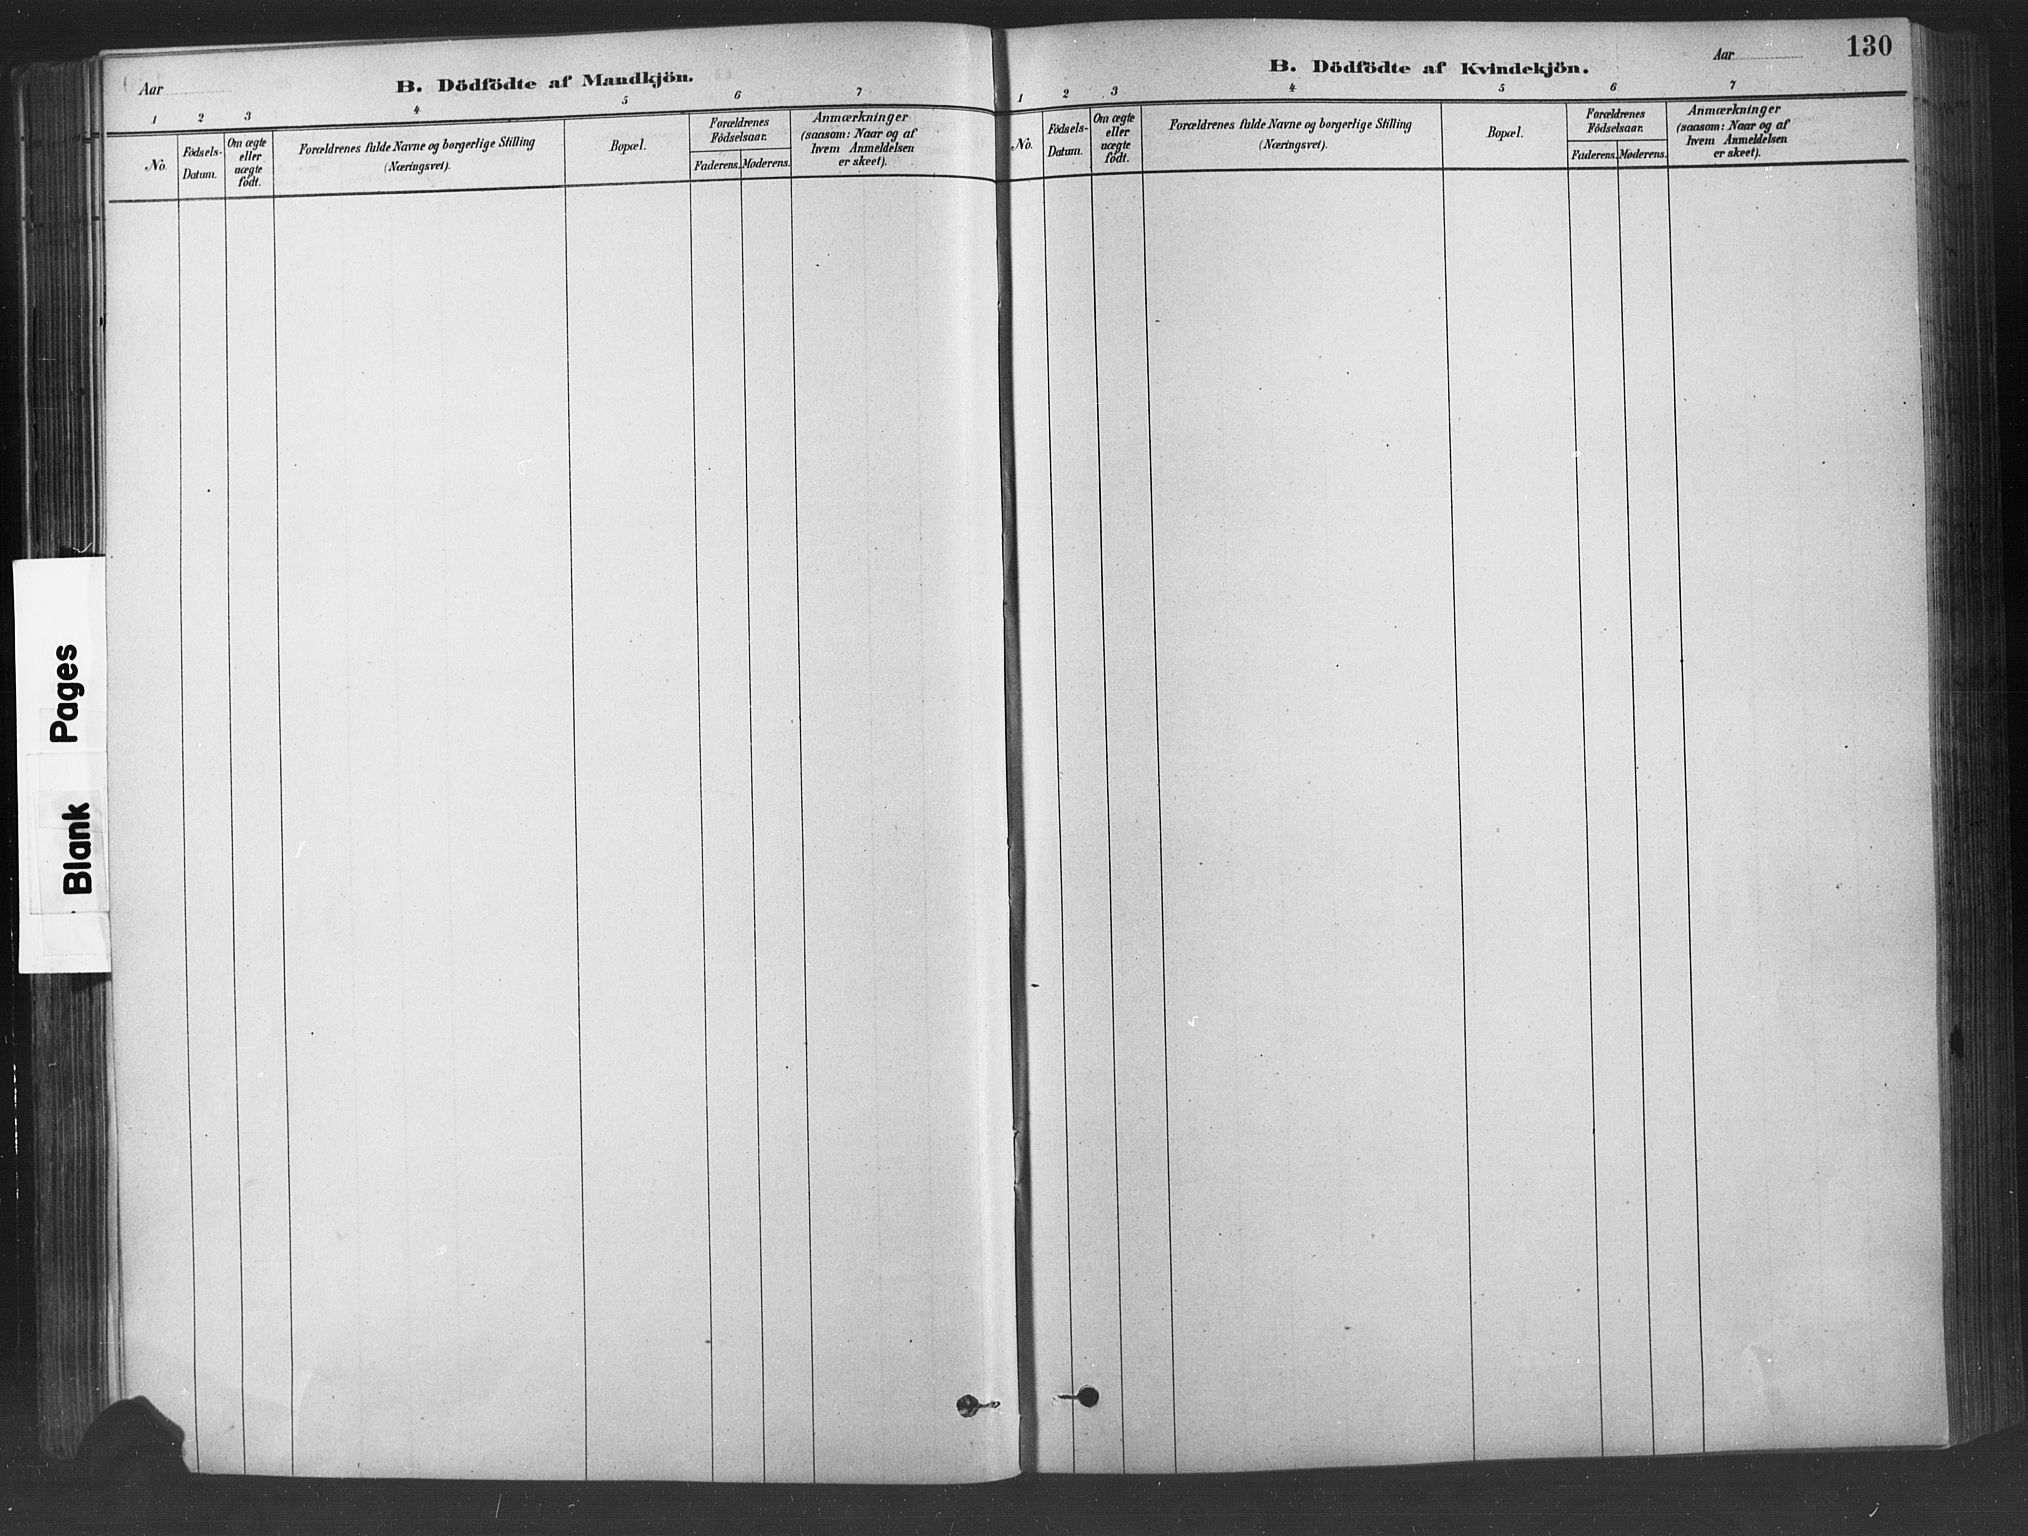 SAH, Fåberg prestekontor, Ministerialbok nr. 9, 1879-1898, s. 130